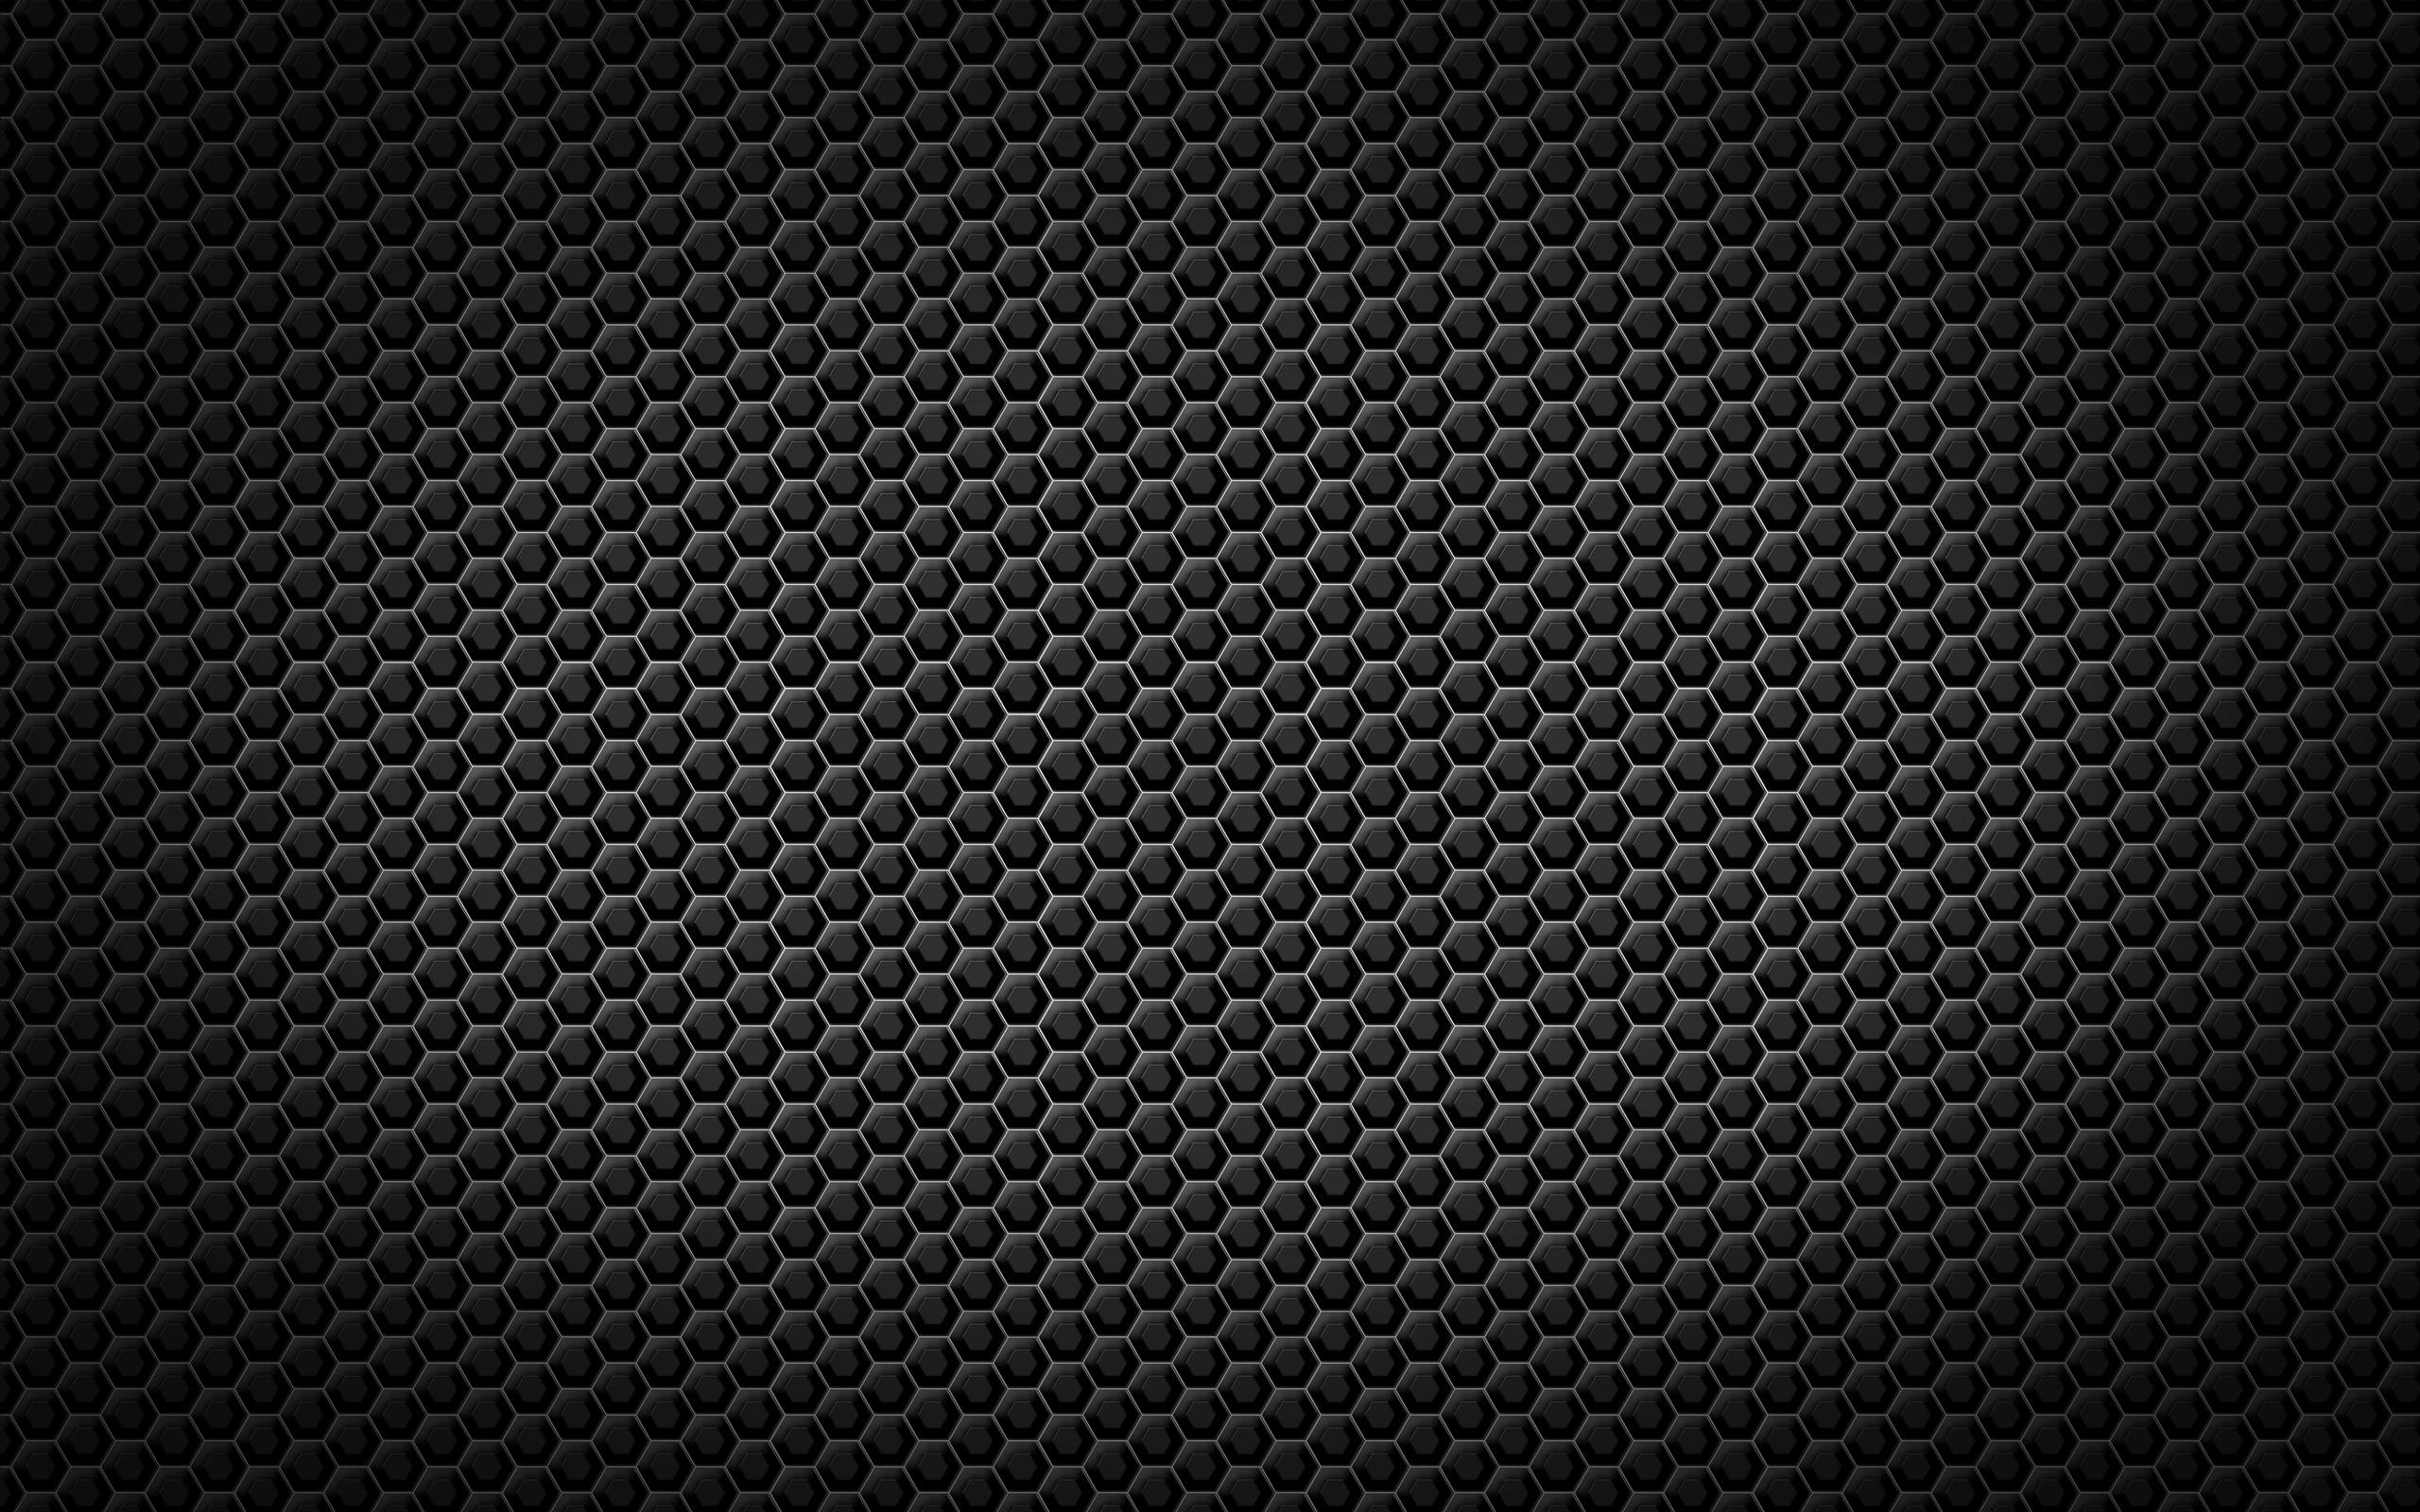 Black Background Wallpaper, Best Black Background Wallpapers in